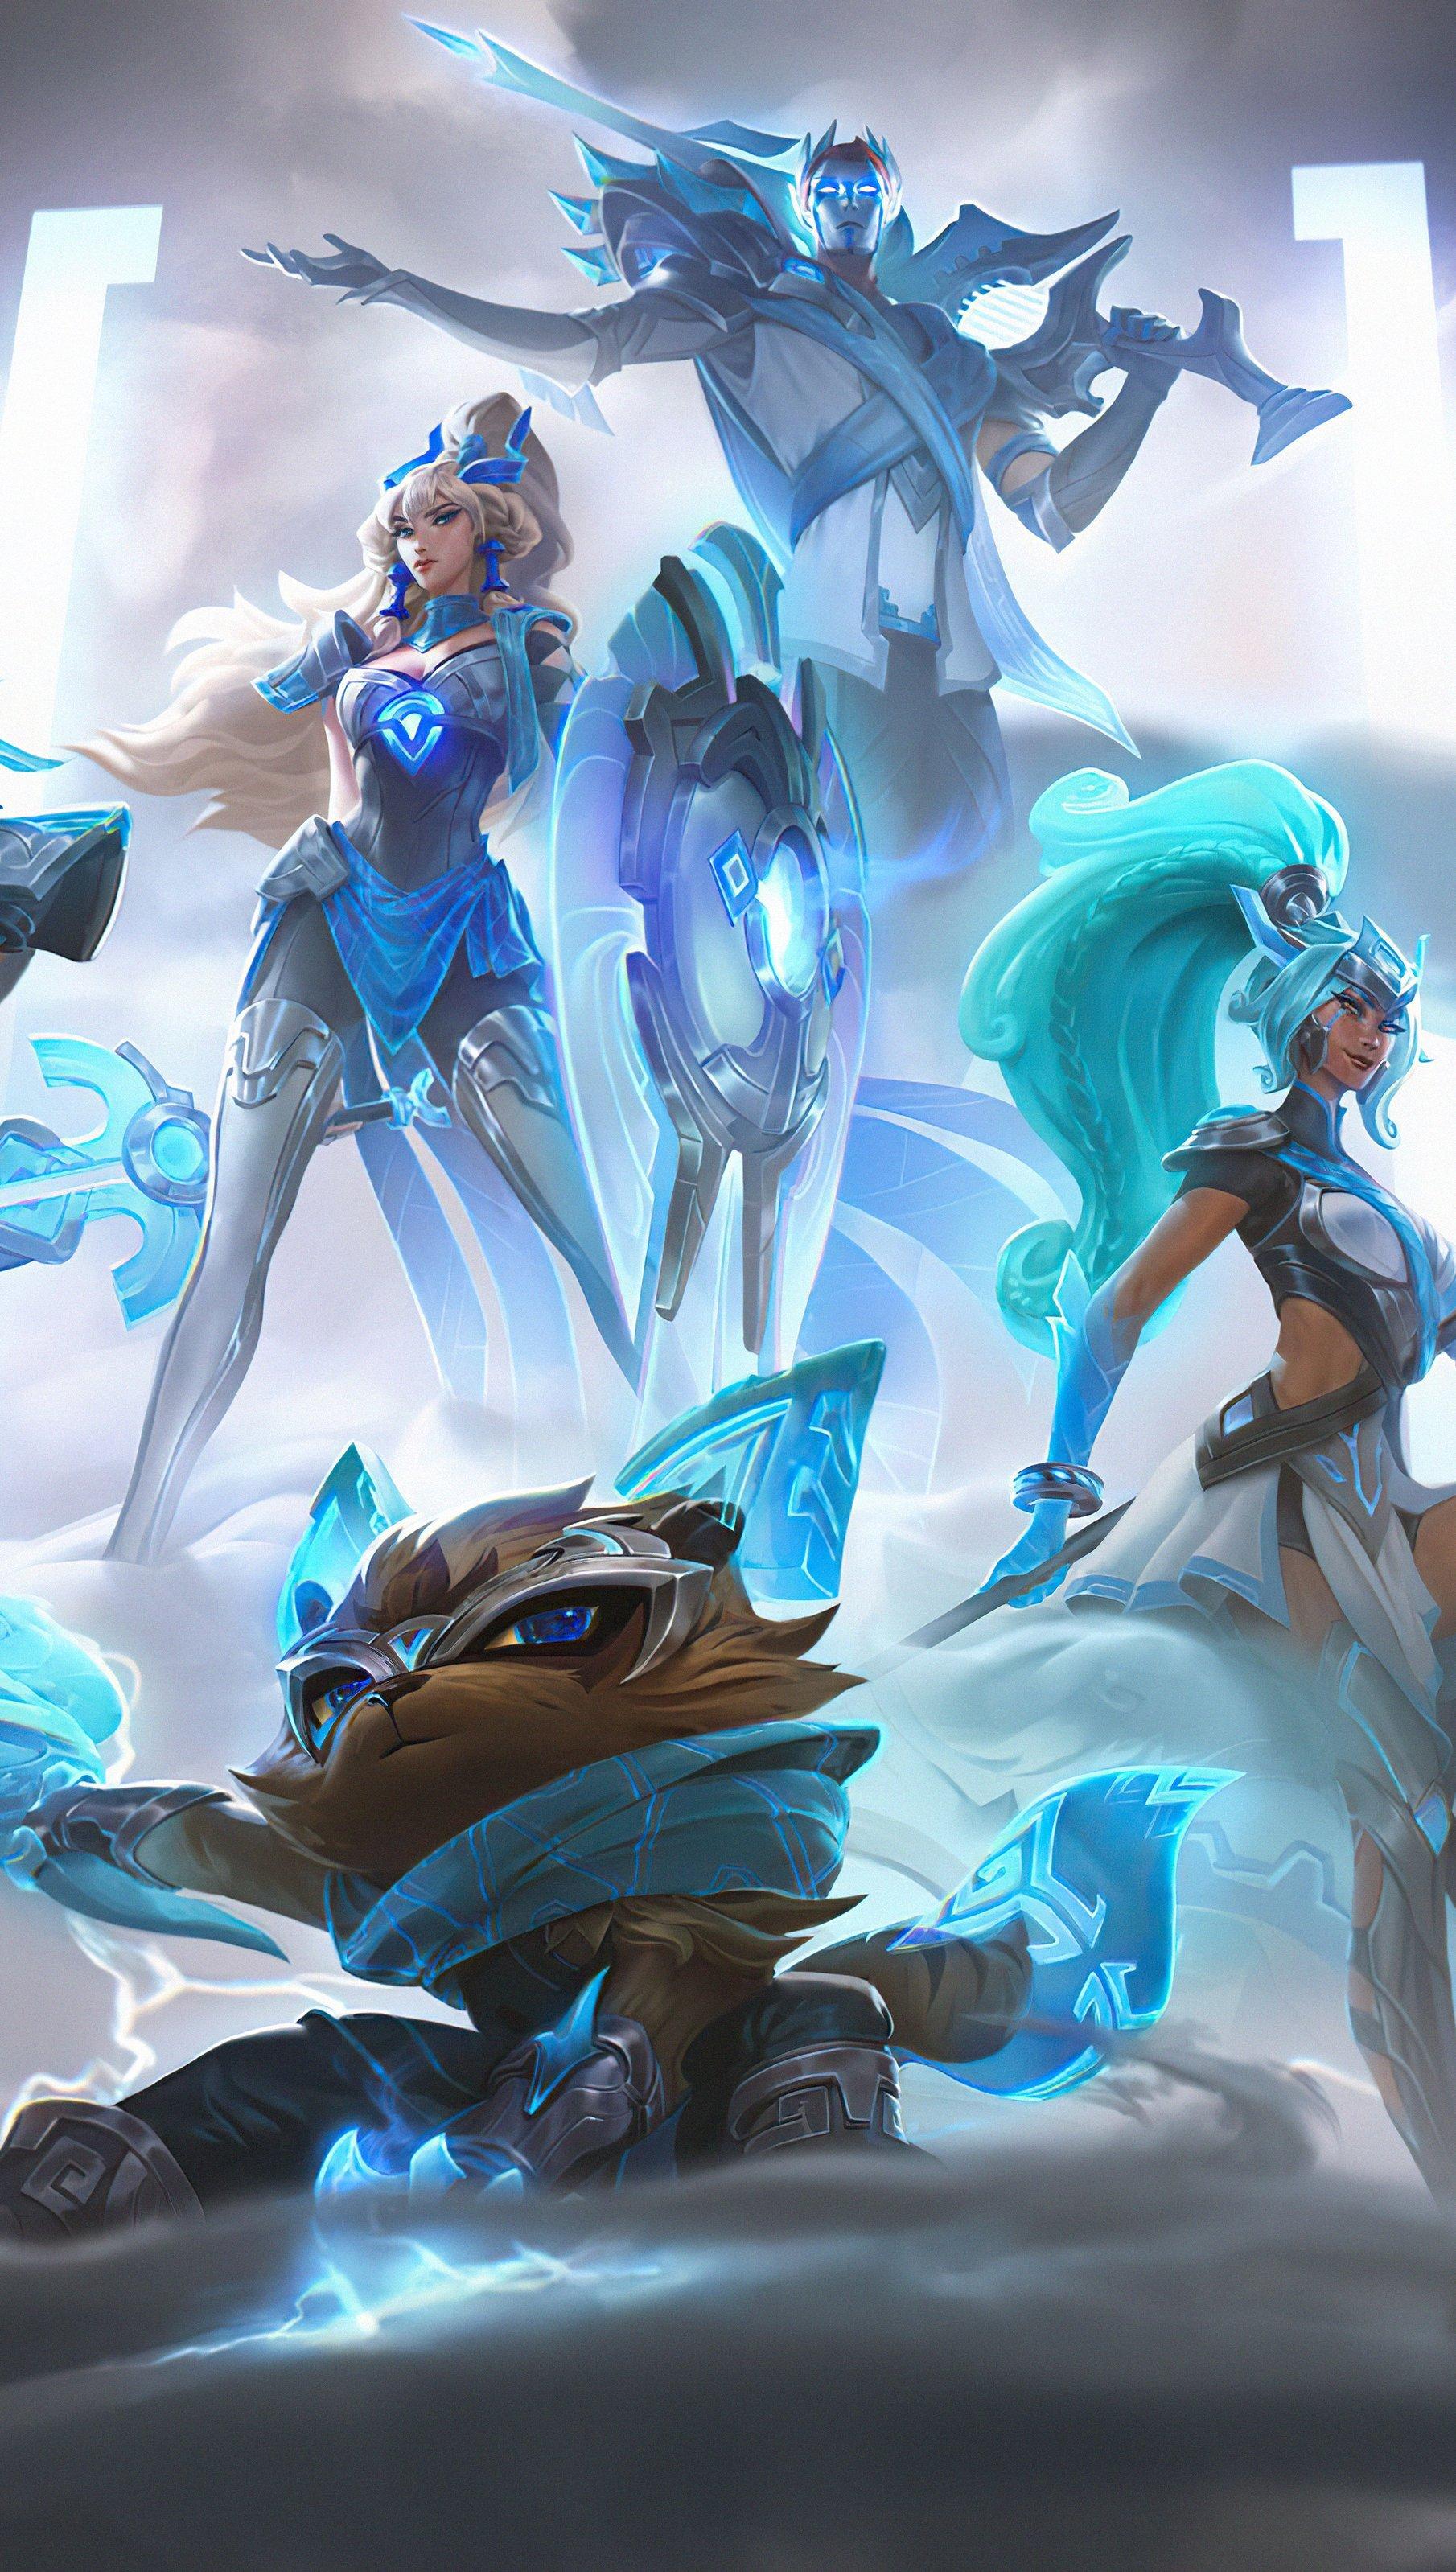 Wallpaper Domwon Gaming League of Legends Vertical